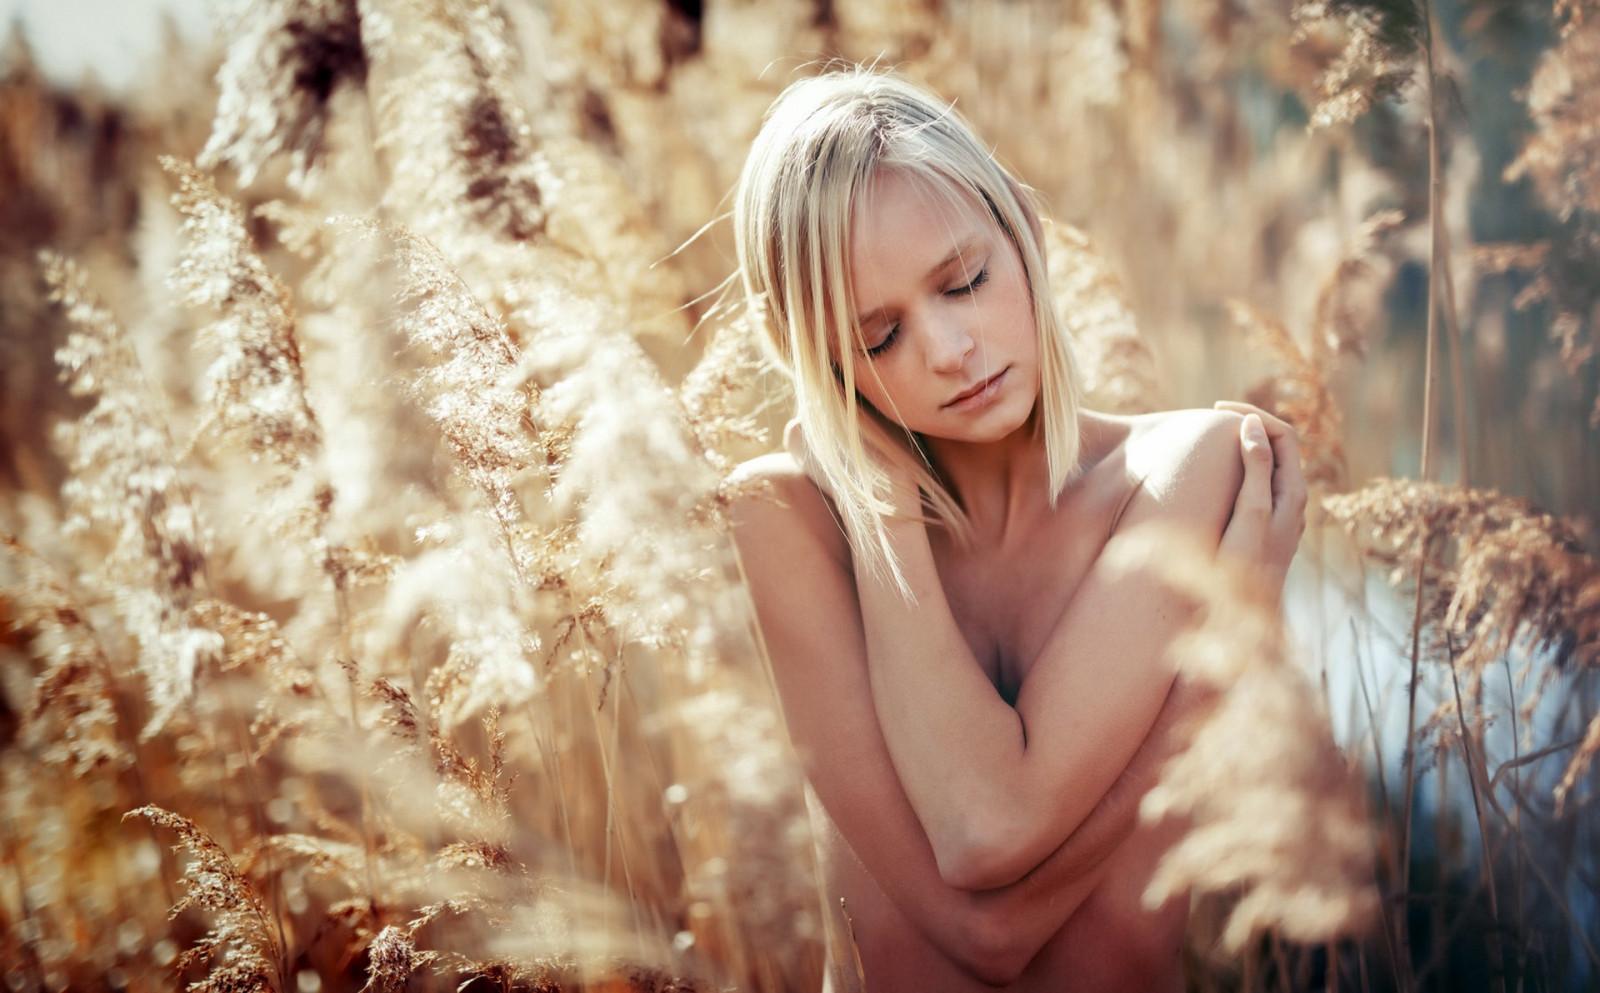 Девушка ласкает себя на свежем воздухе (10 фотографий)